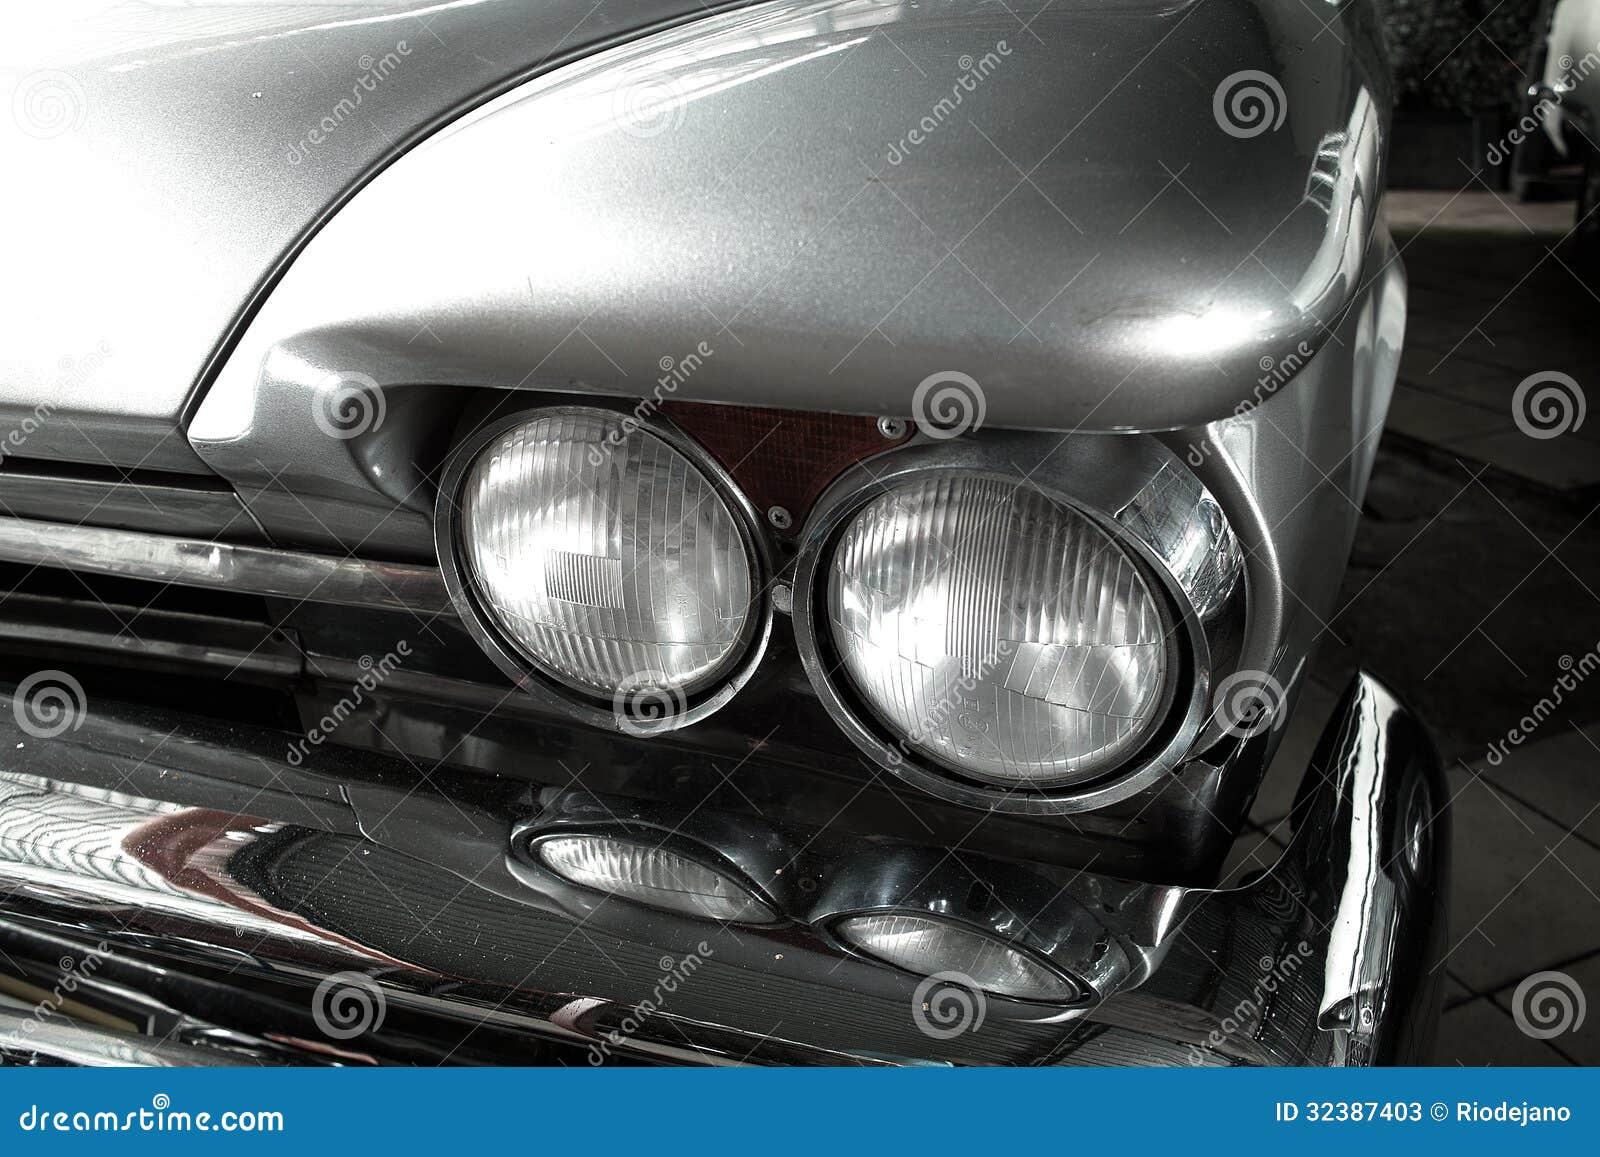 Old Car Headlight On Transparency : Old car stock photo cartoondealer